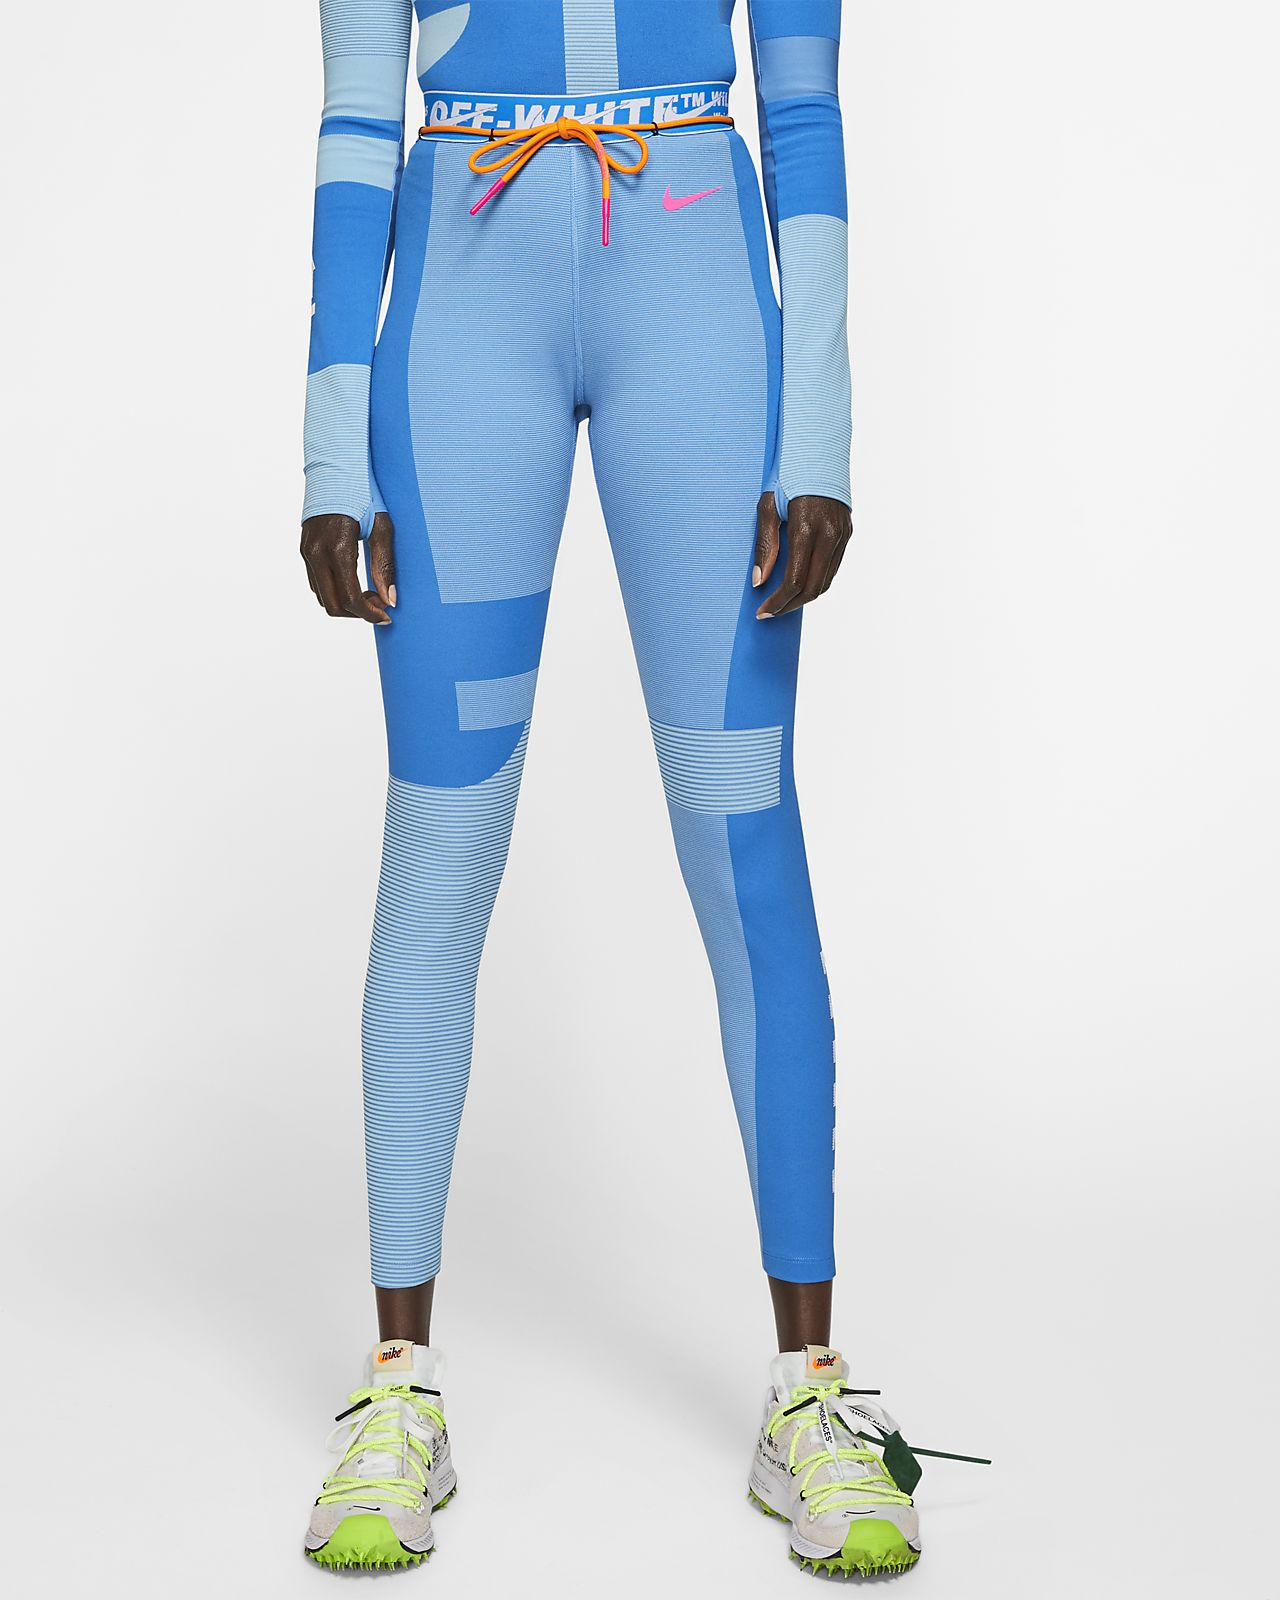 nike running tights salg på nett, Nike Sportswear CORTEZ